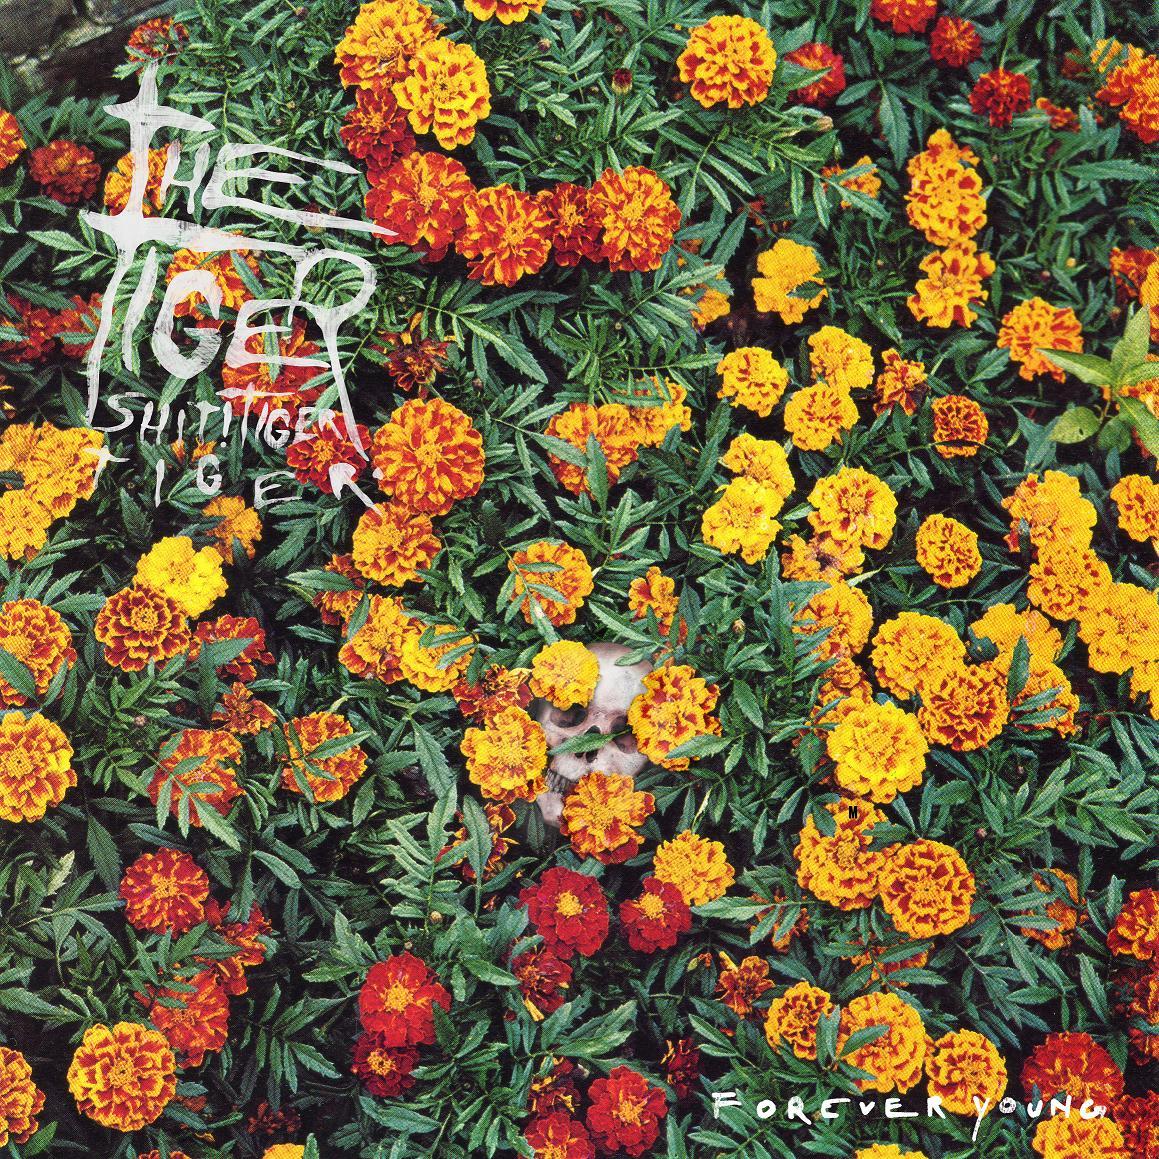 Tiger! Shit! Tiger! Tiger! - Forever Young CD/LP/MC